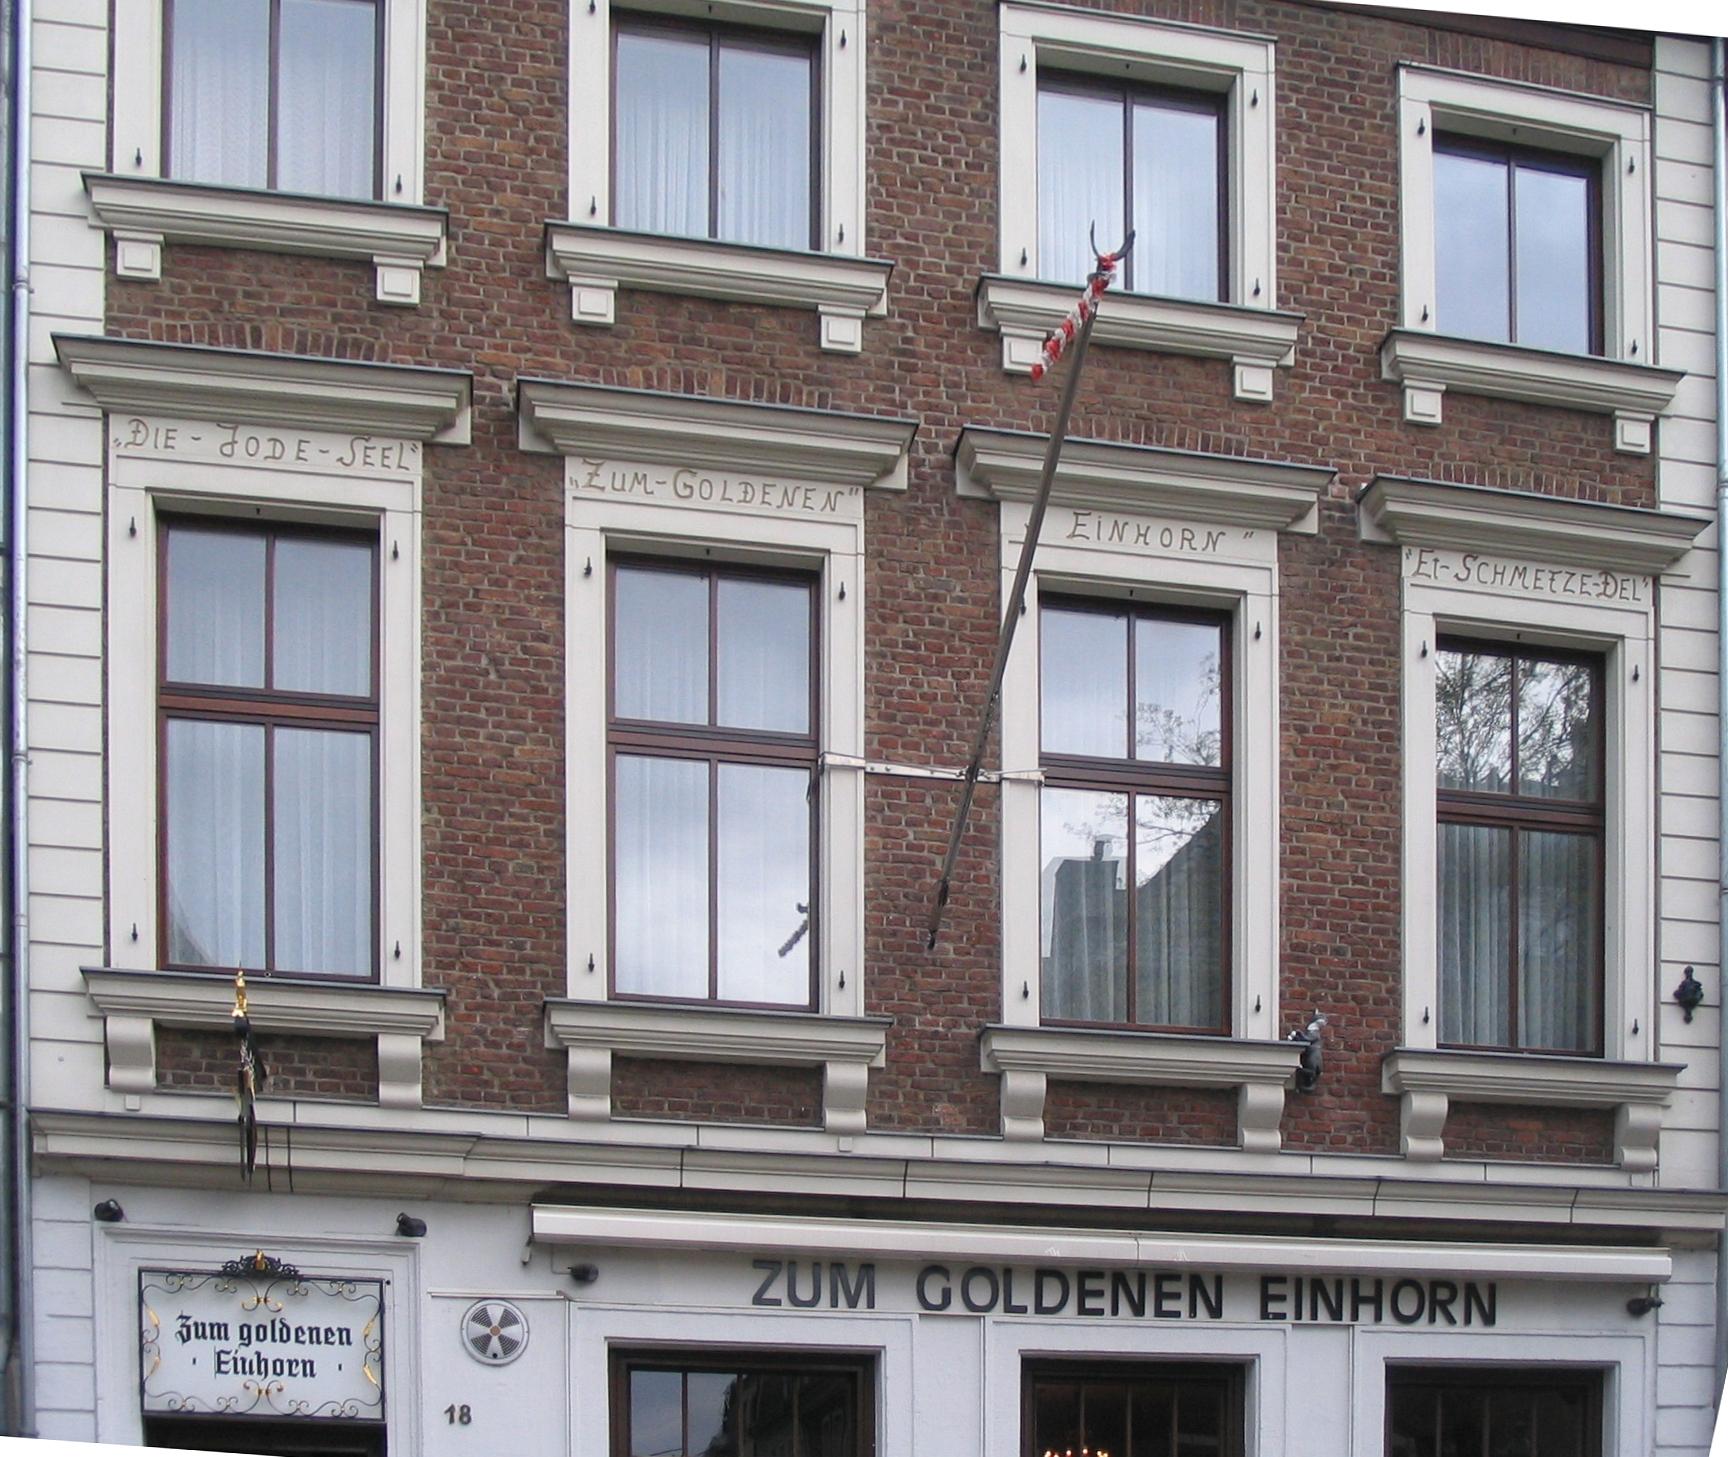 Einhorn Düsseldorf file düsseldorf ratinger straße 18 2012 3 jpg wikimedia commons